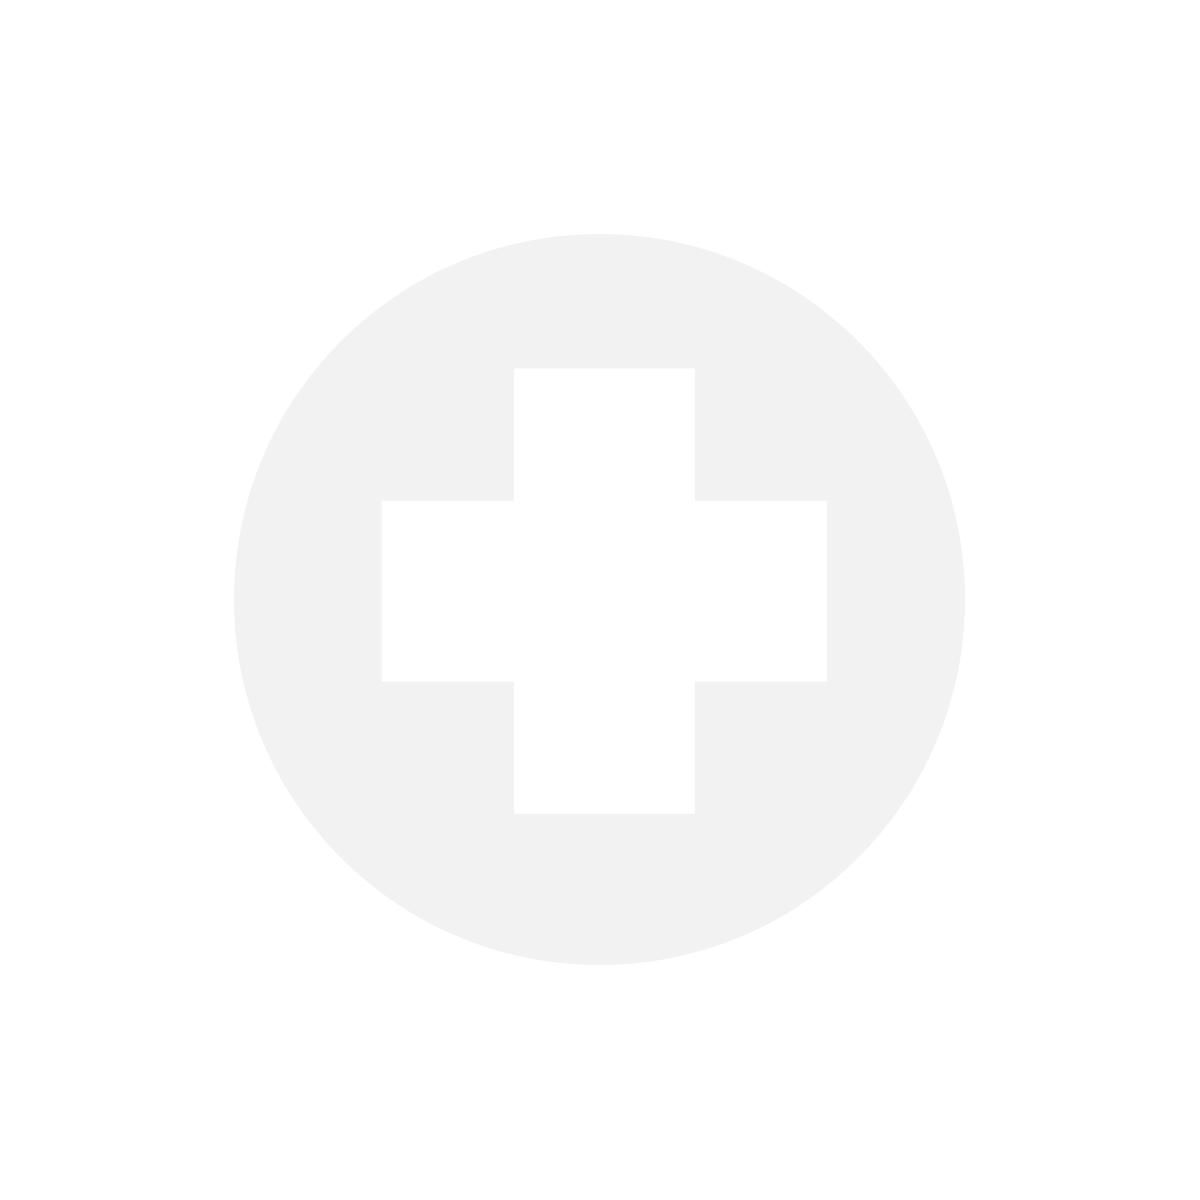 SONIC VITAL - Tête 1cm²